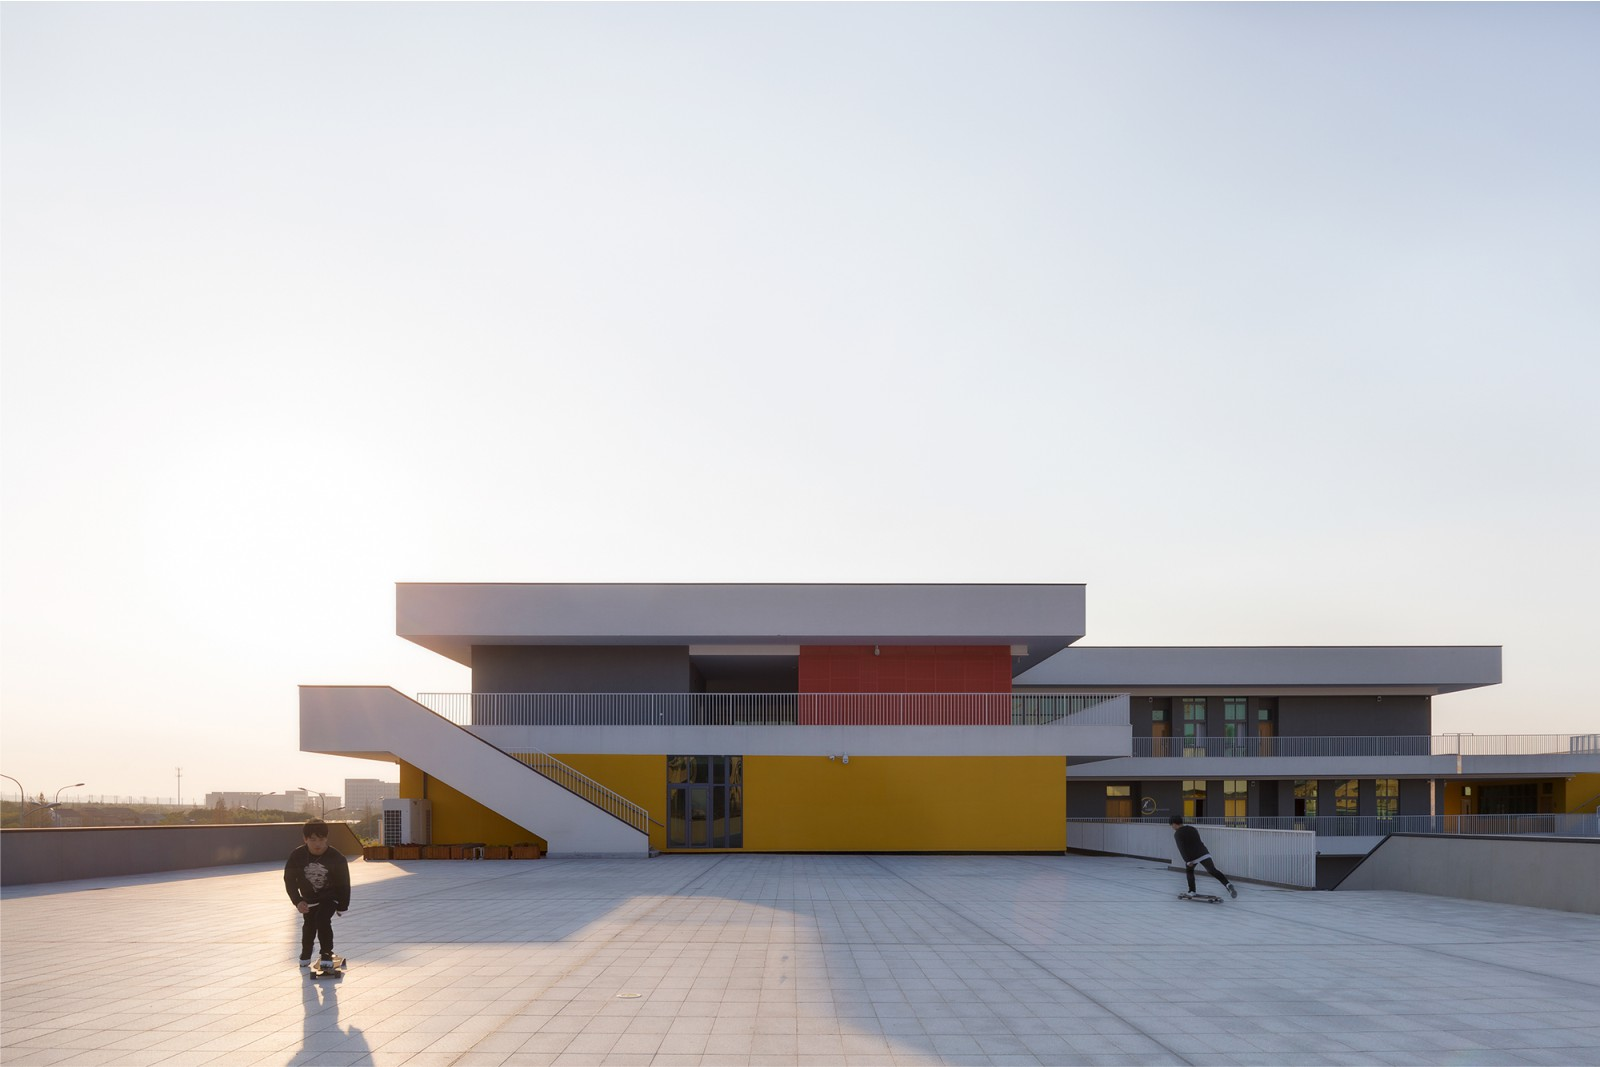 Hanvos School